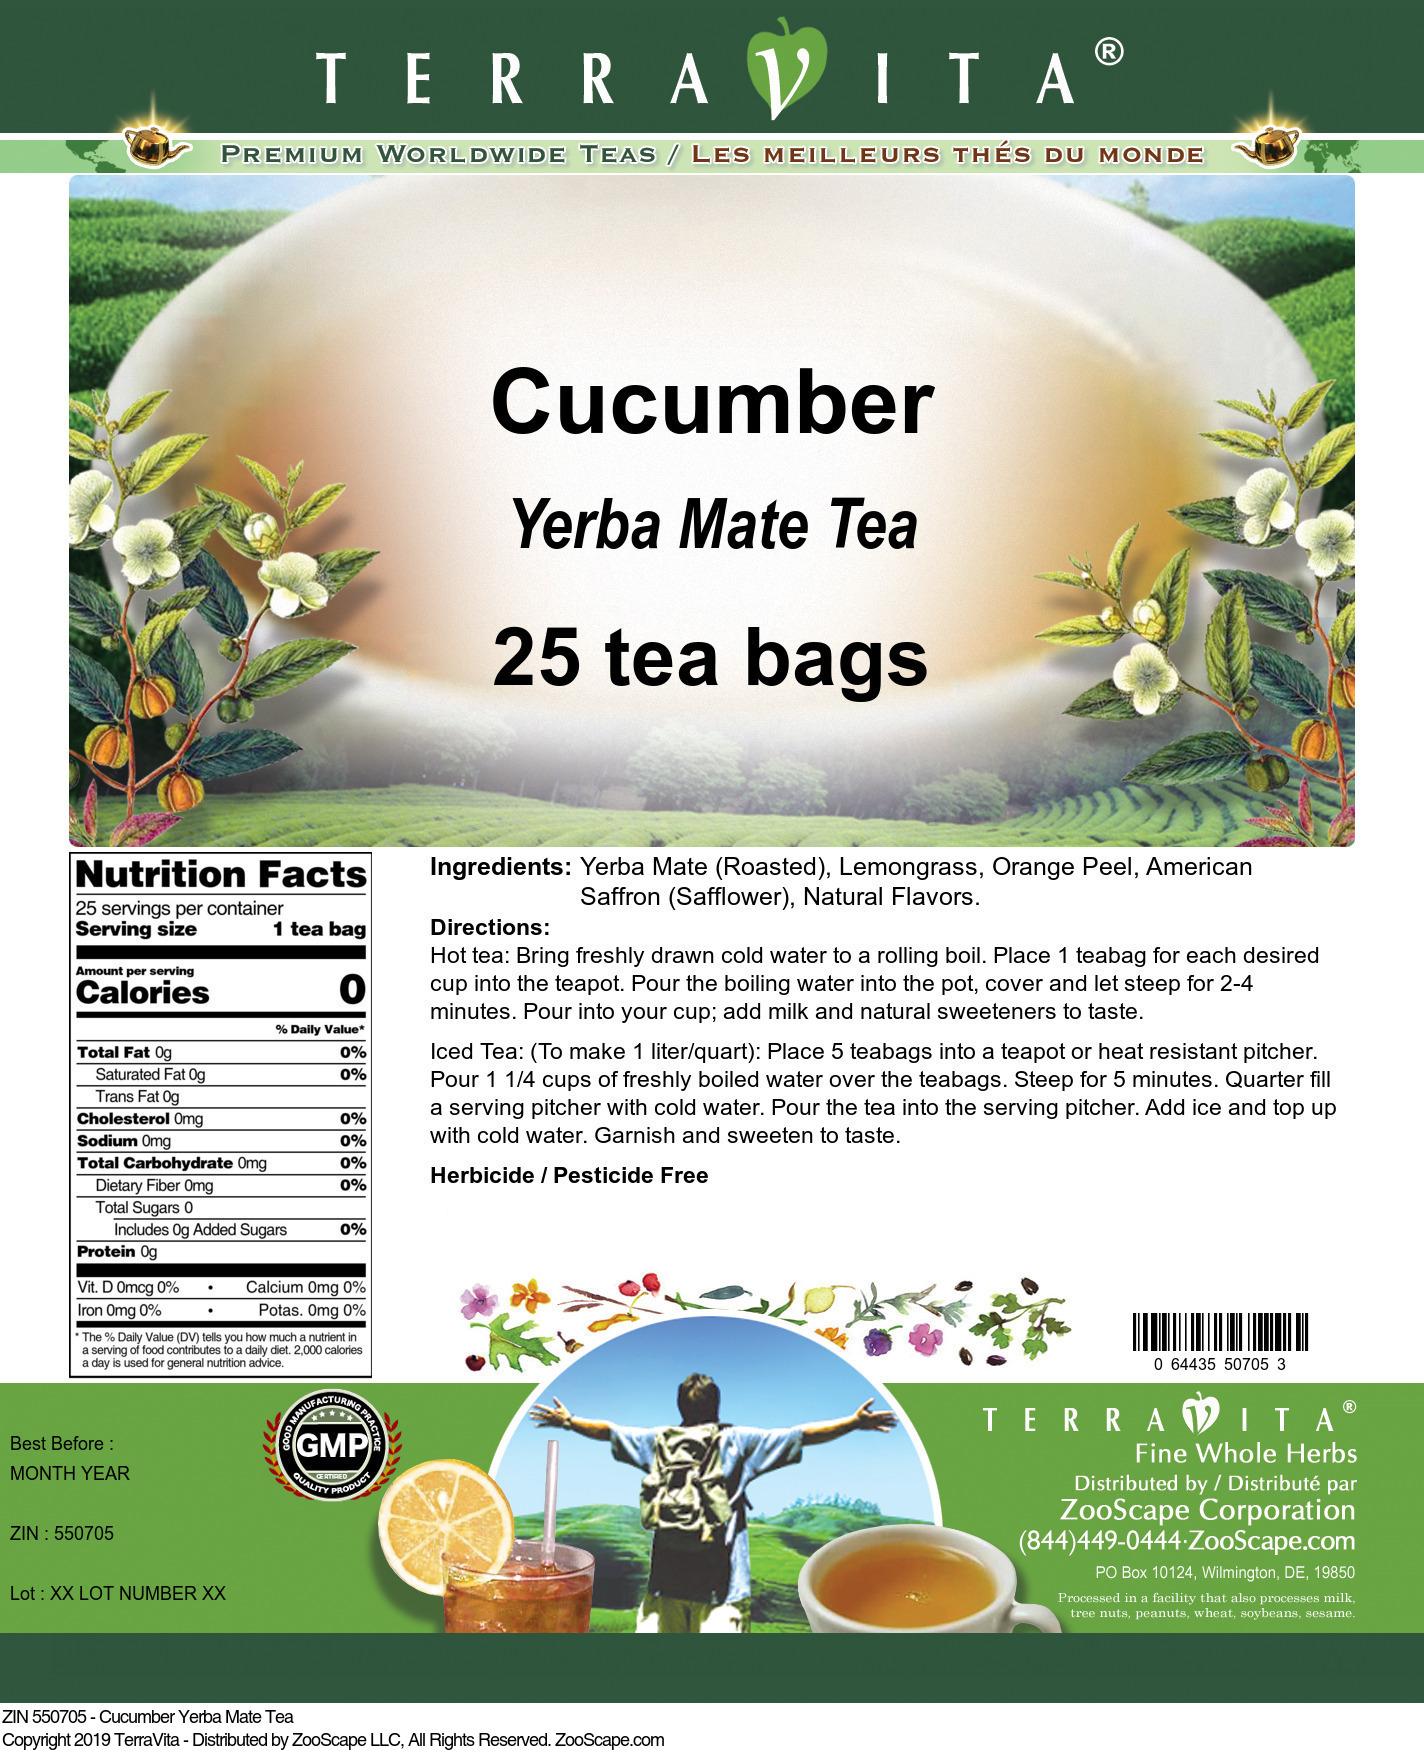 Cucumber Yerba Mate Tea